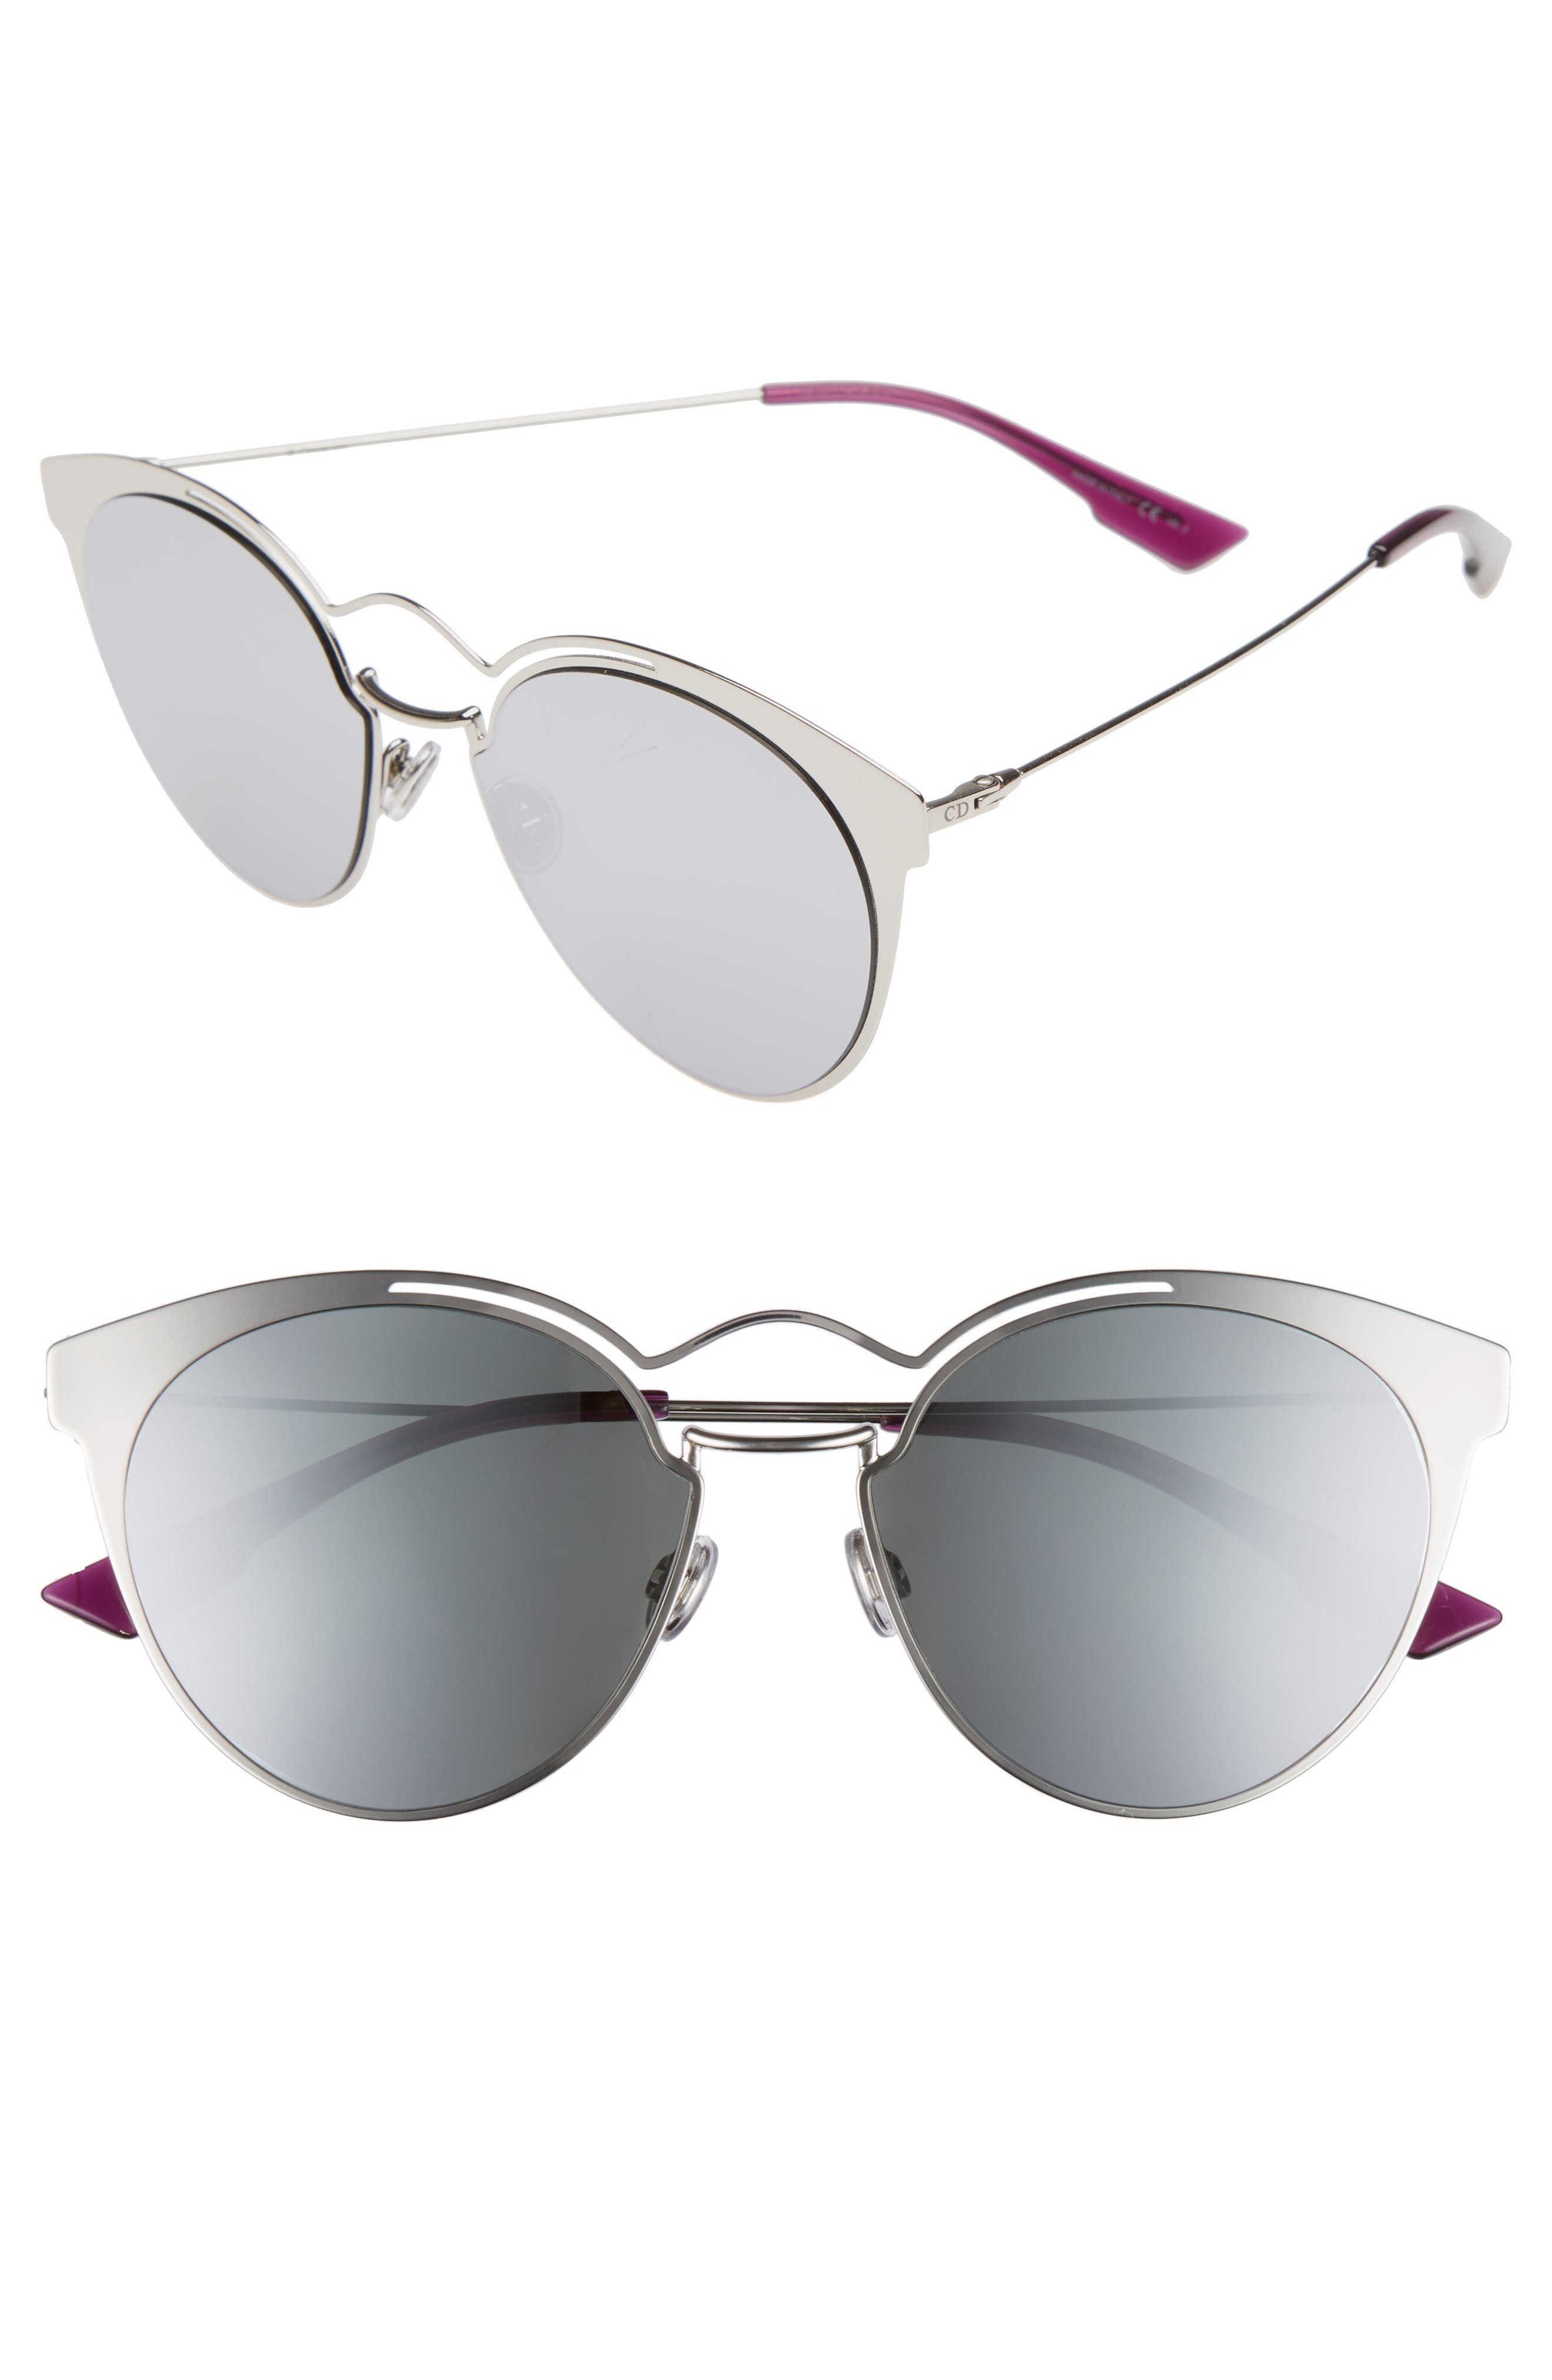 Nebuls 54mm Sunglasses,                         Main,                         color, Palladium